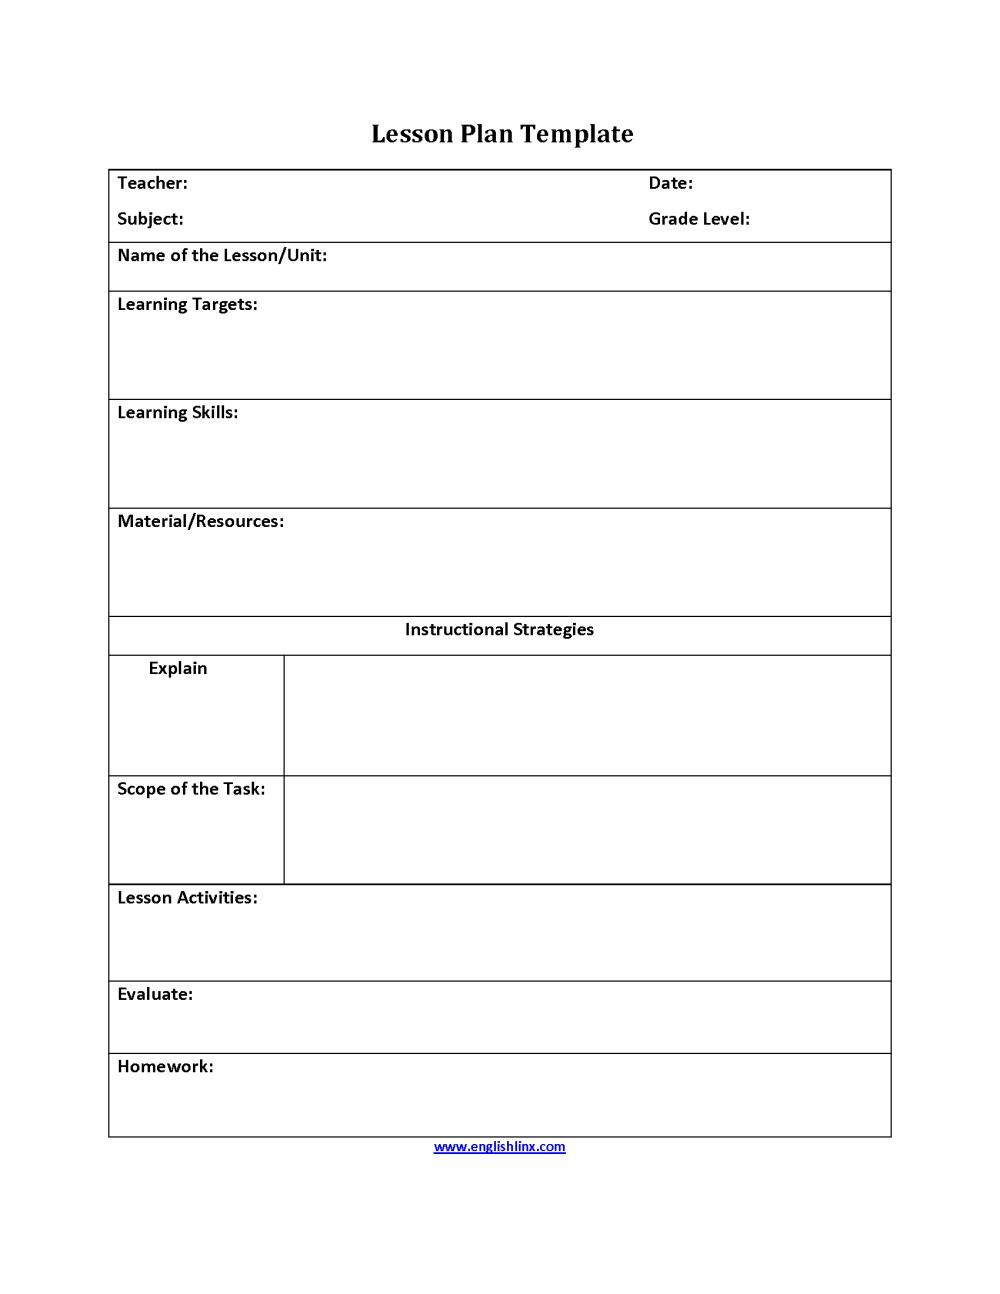 medium resolution of Englishlinx.com   Lesson Plan Template